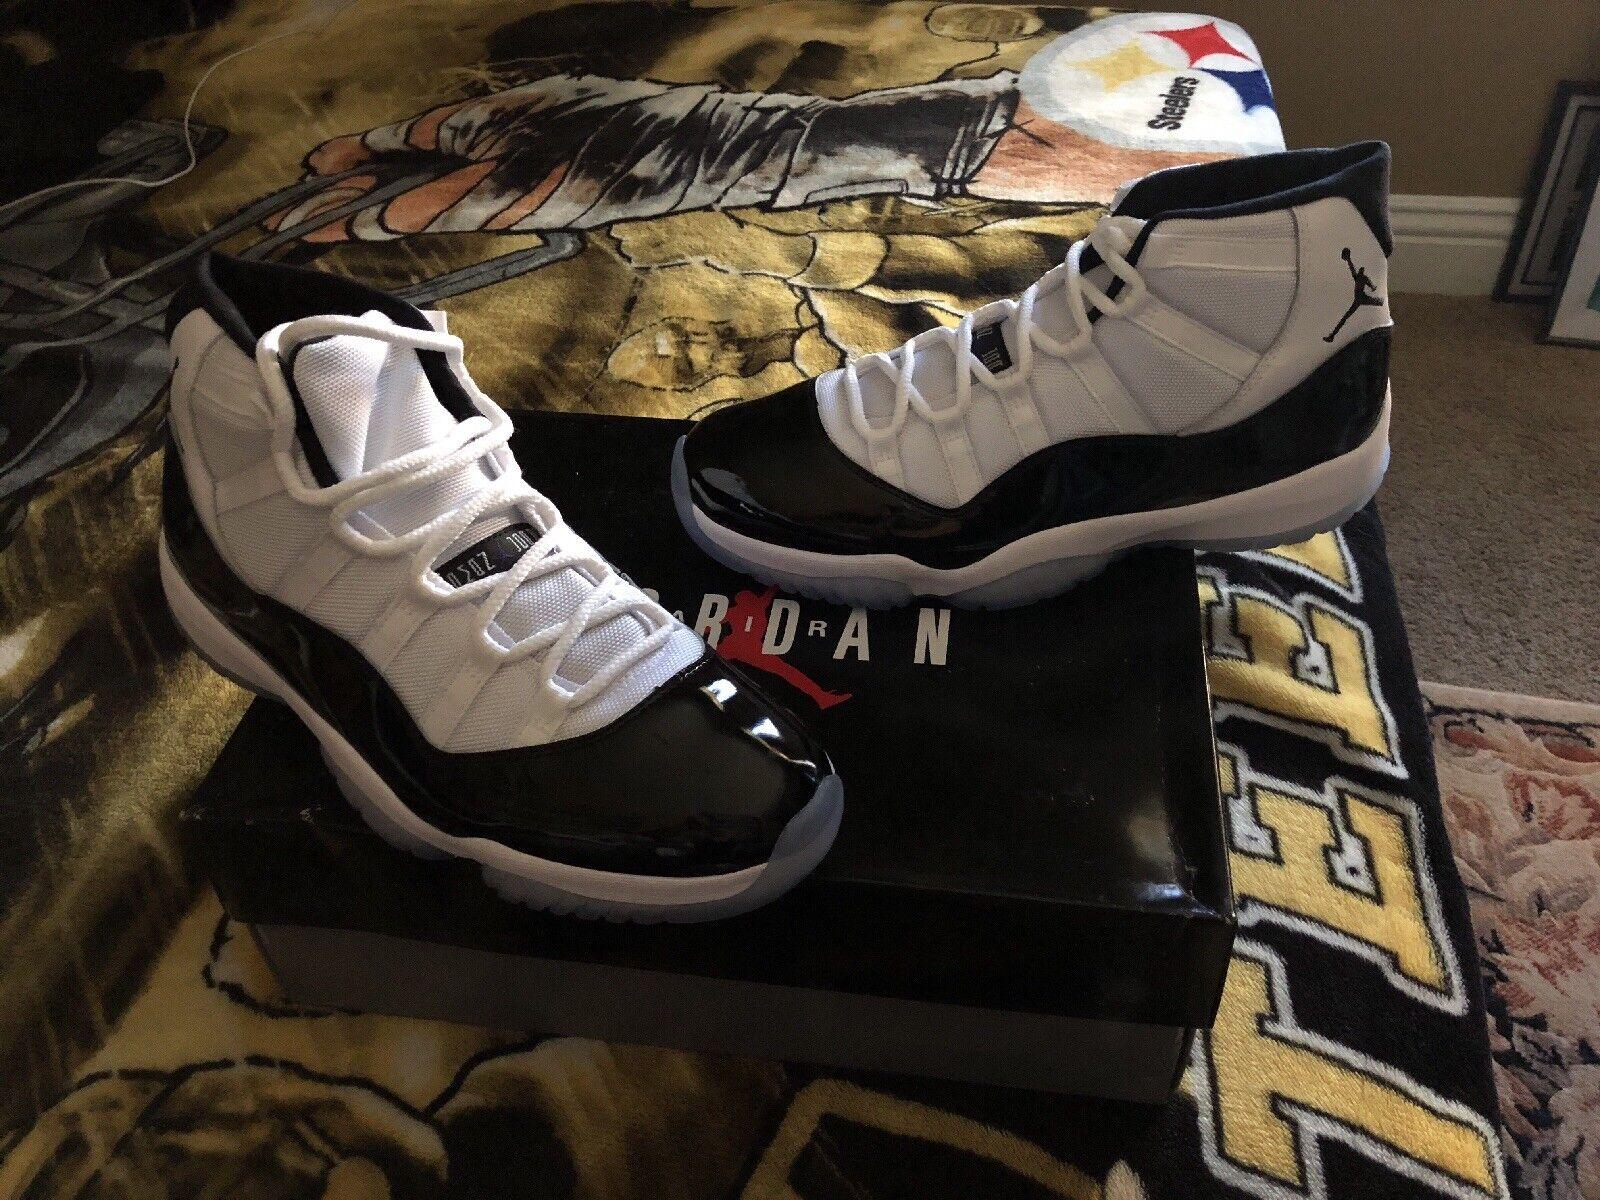 Air Jordan 11 Concord 2018 Size 11.5 w  receipt